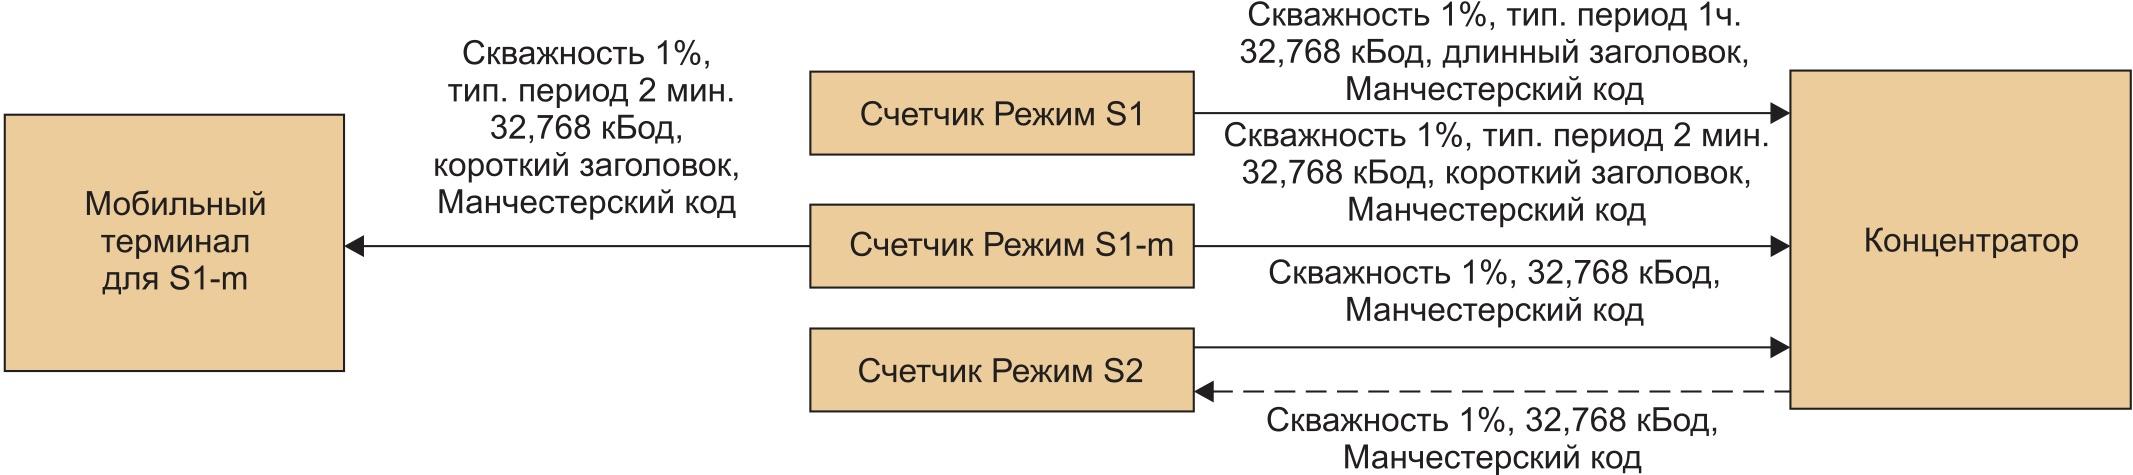 Режим S стандарта EN 13757-4:2010